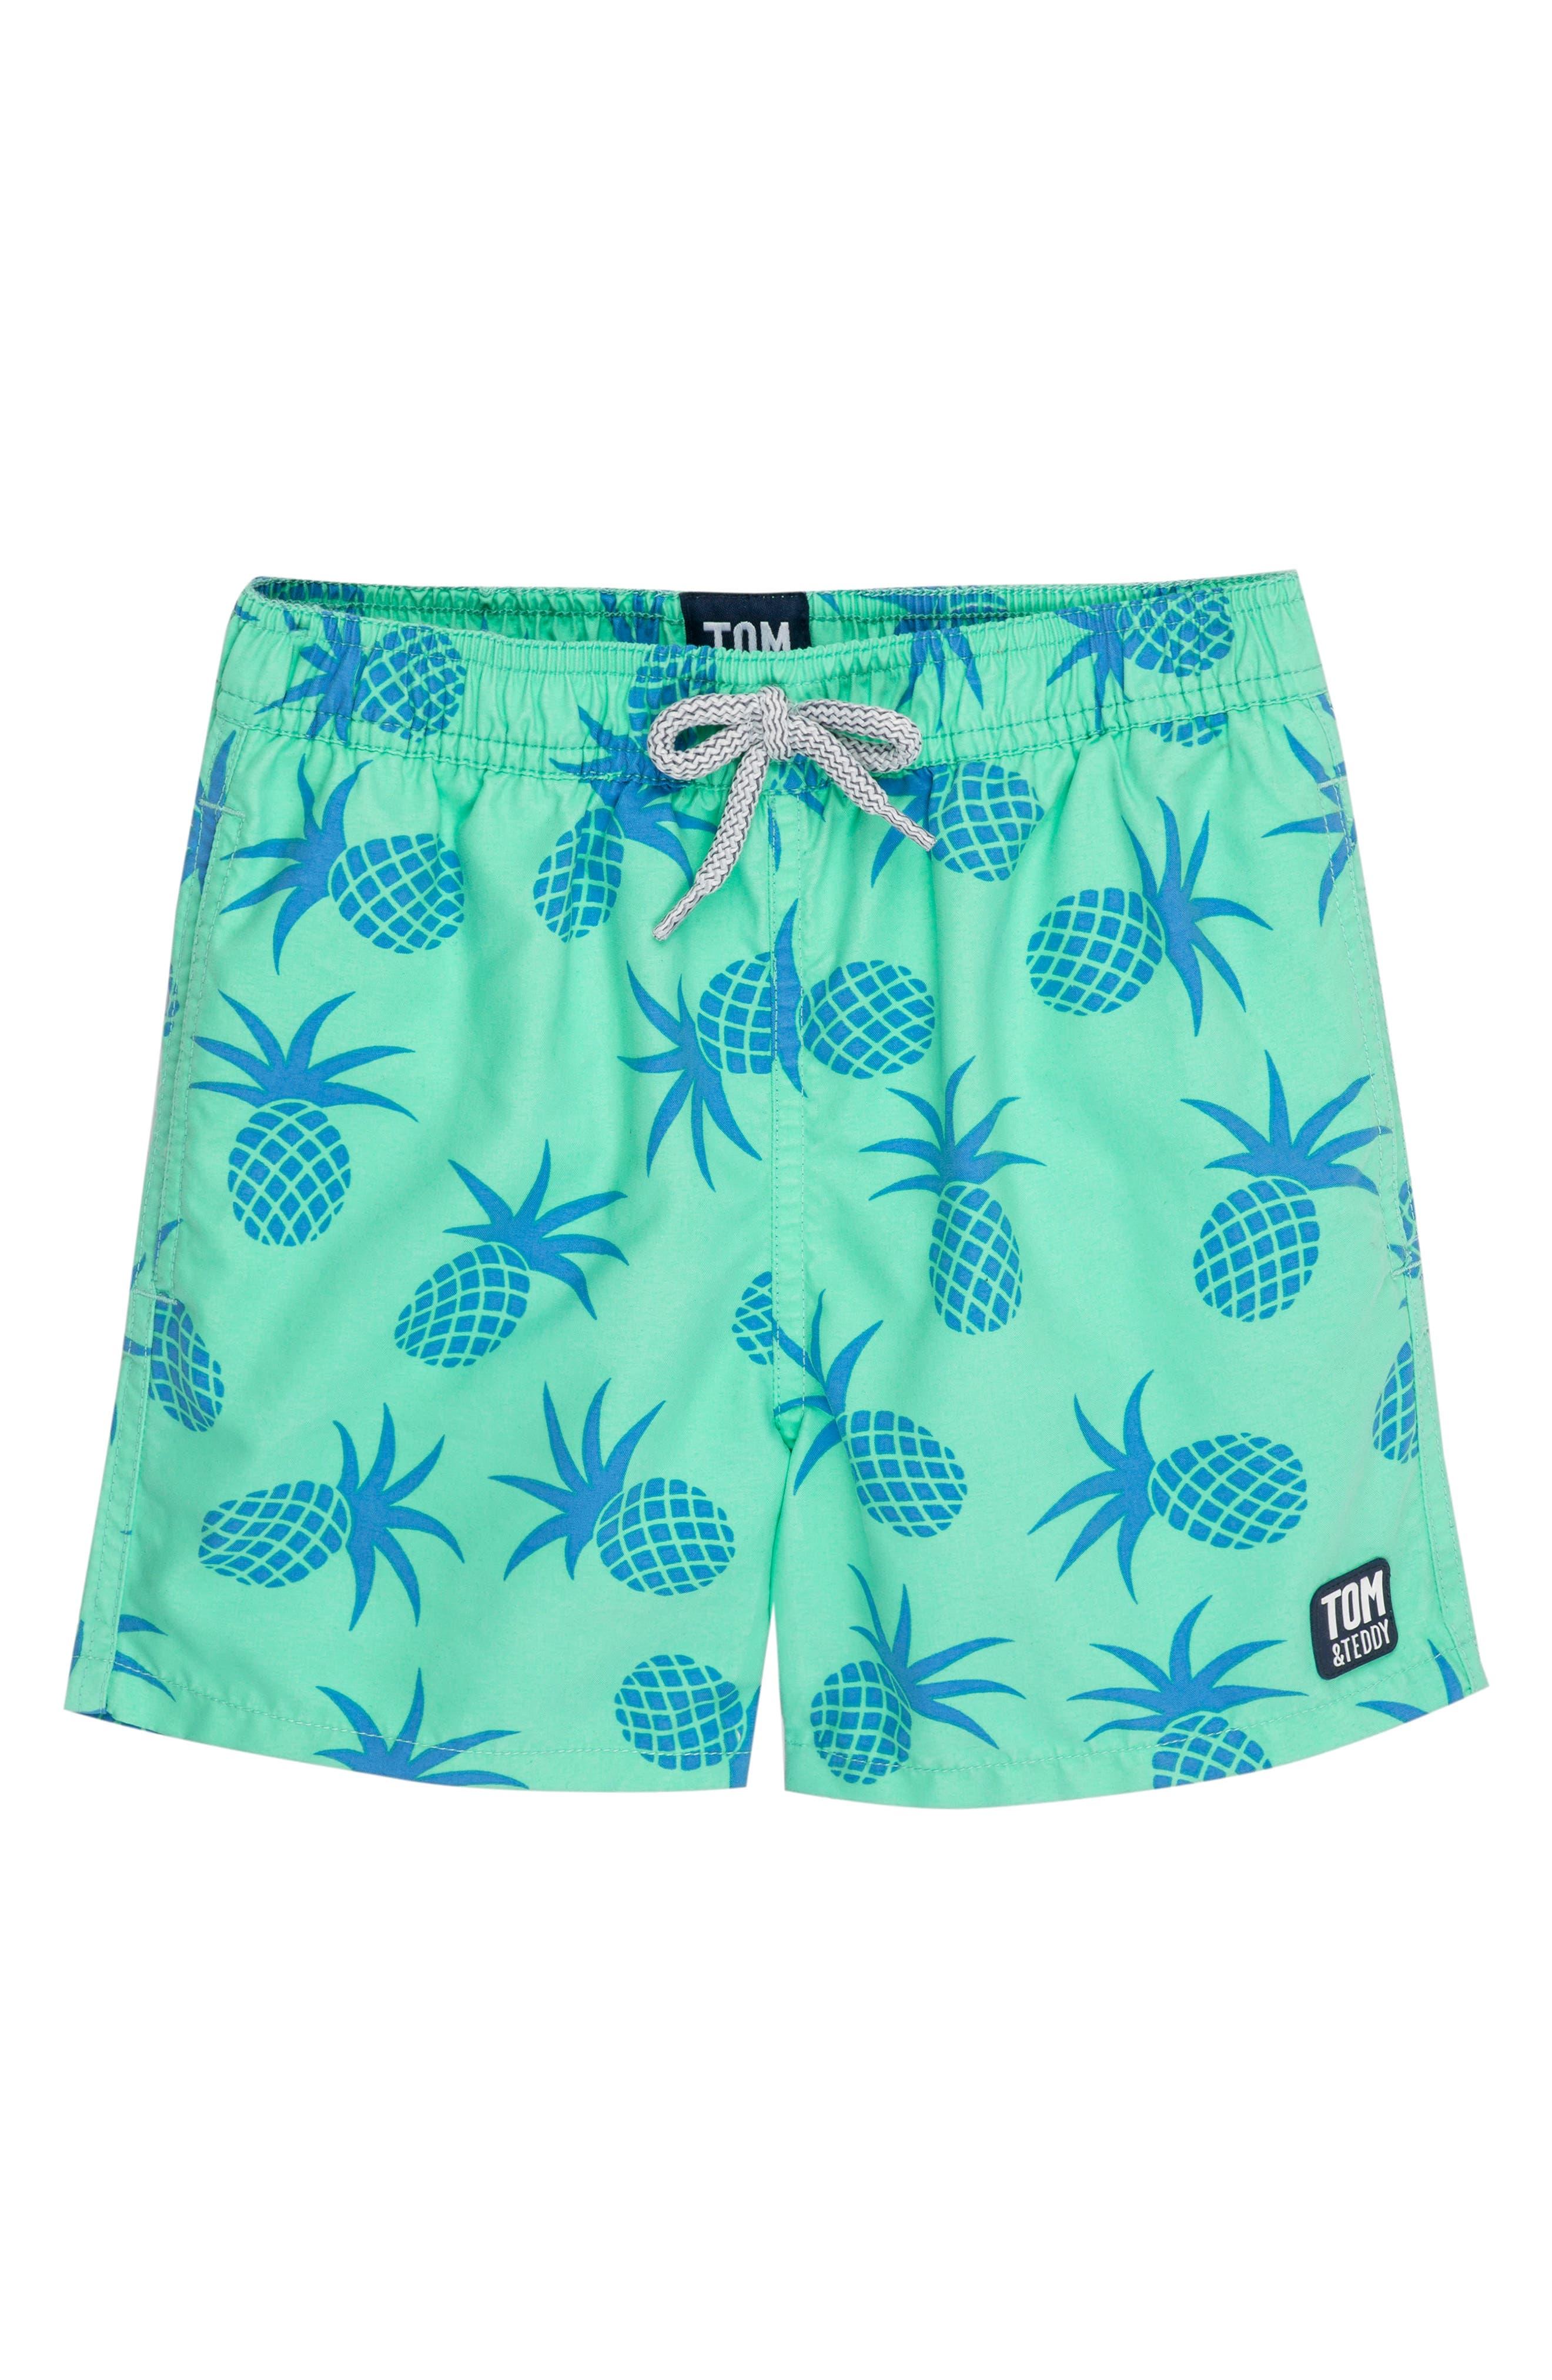 Pineapple Swim Trunks,                         Main,                         color, JADE GREEN